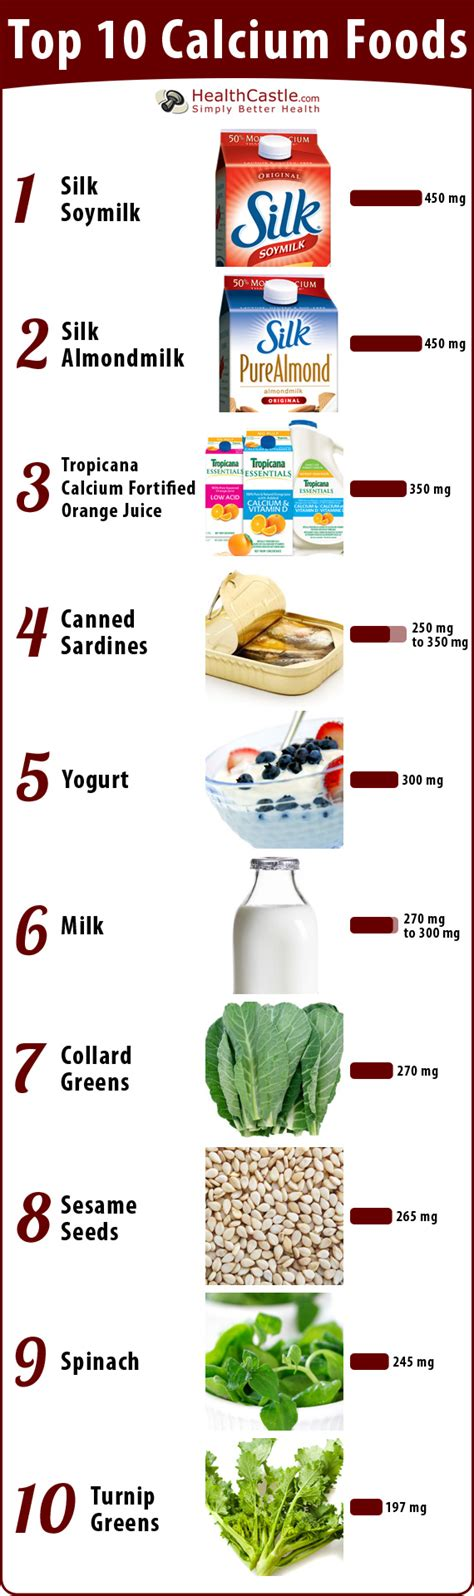 top 10 cuisines in the top 10 calcium foods poster from health castle calcium